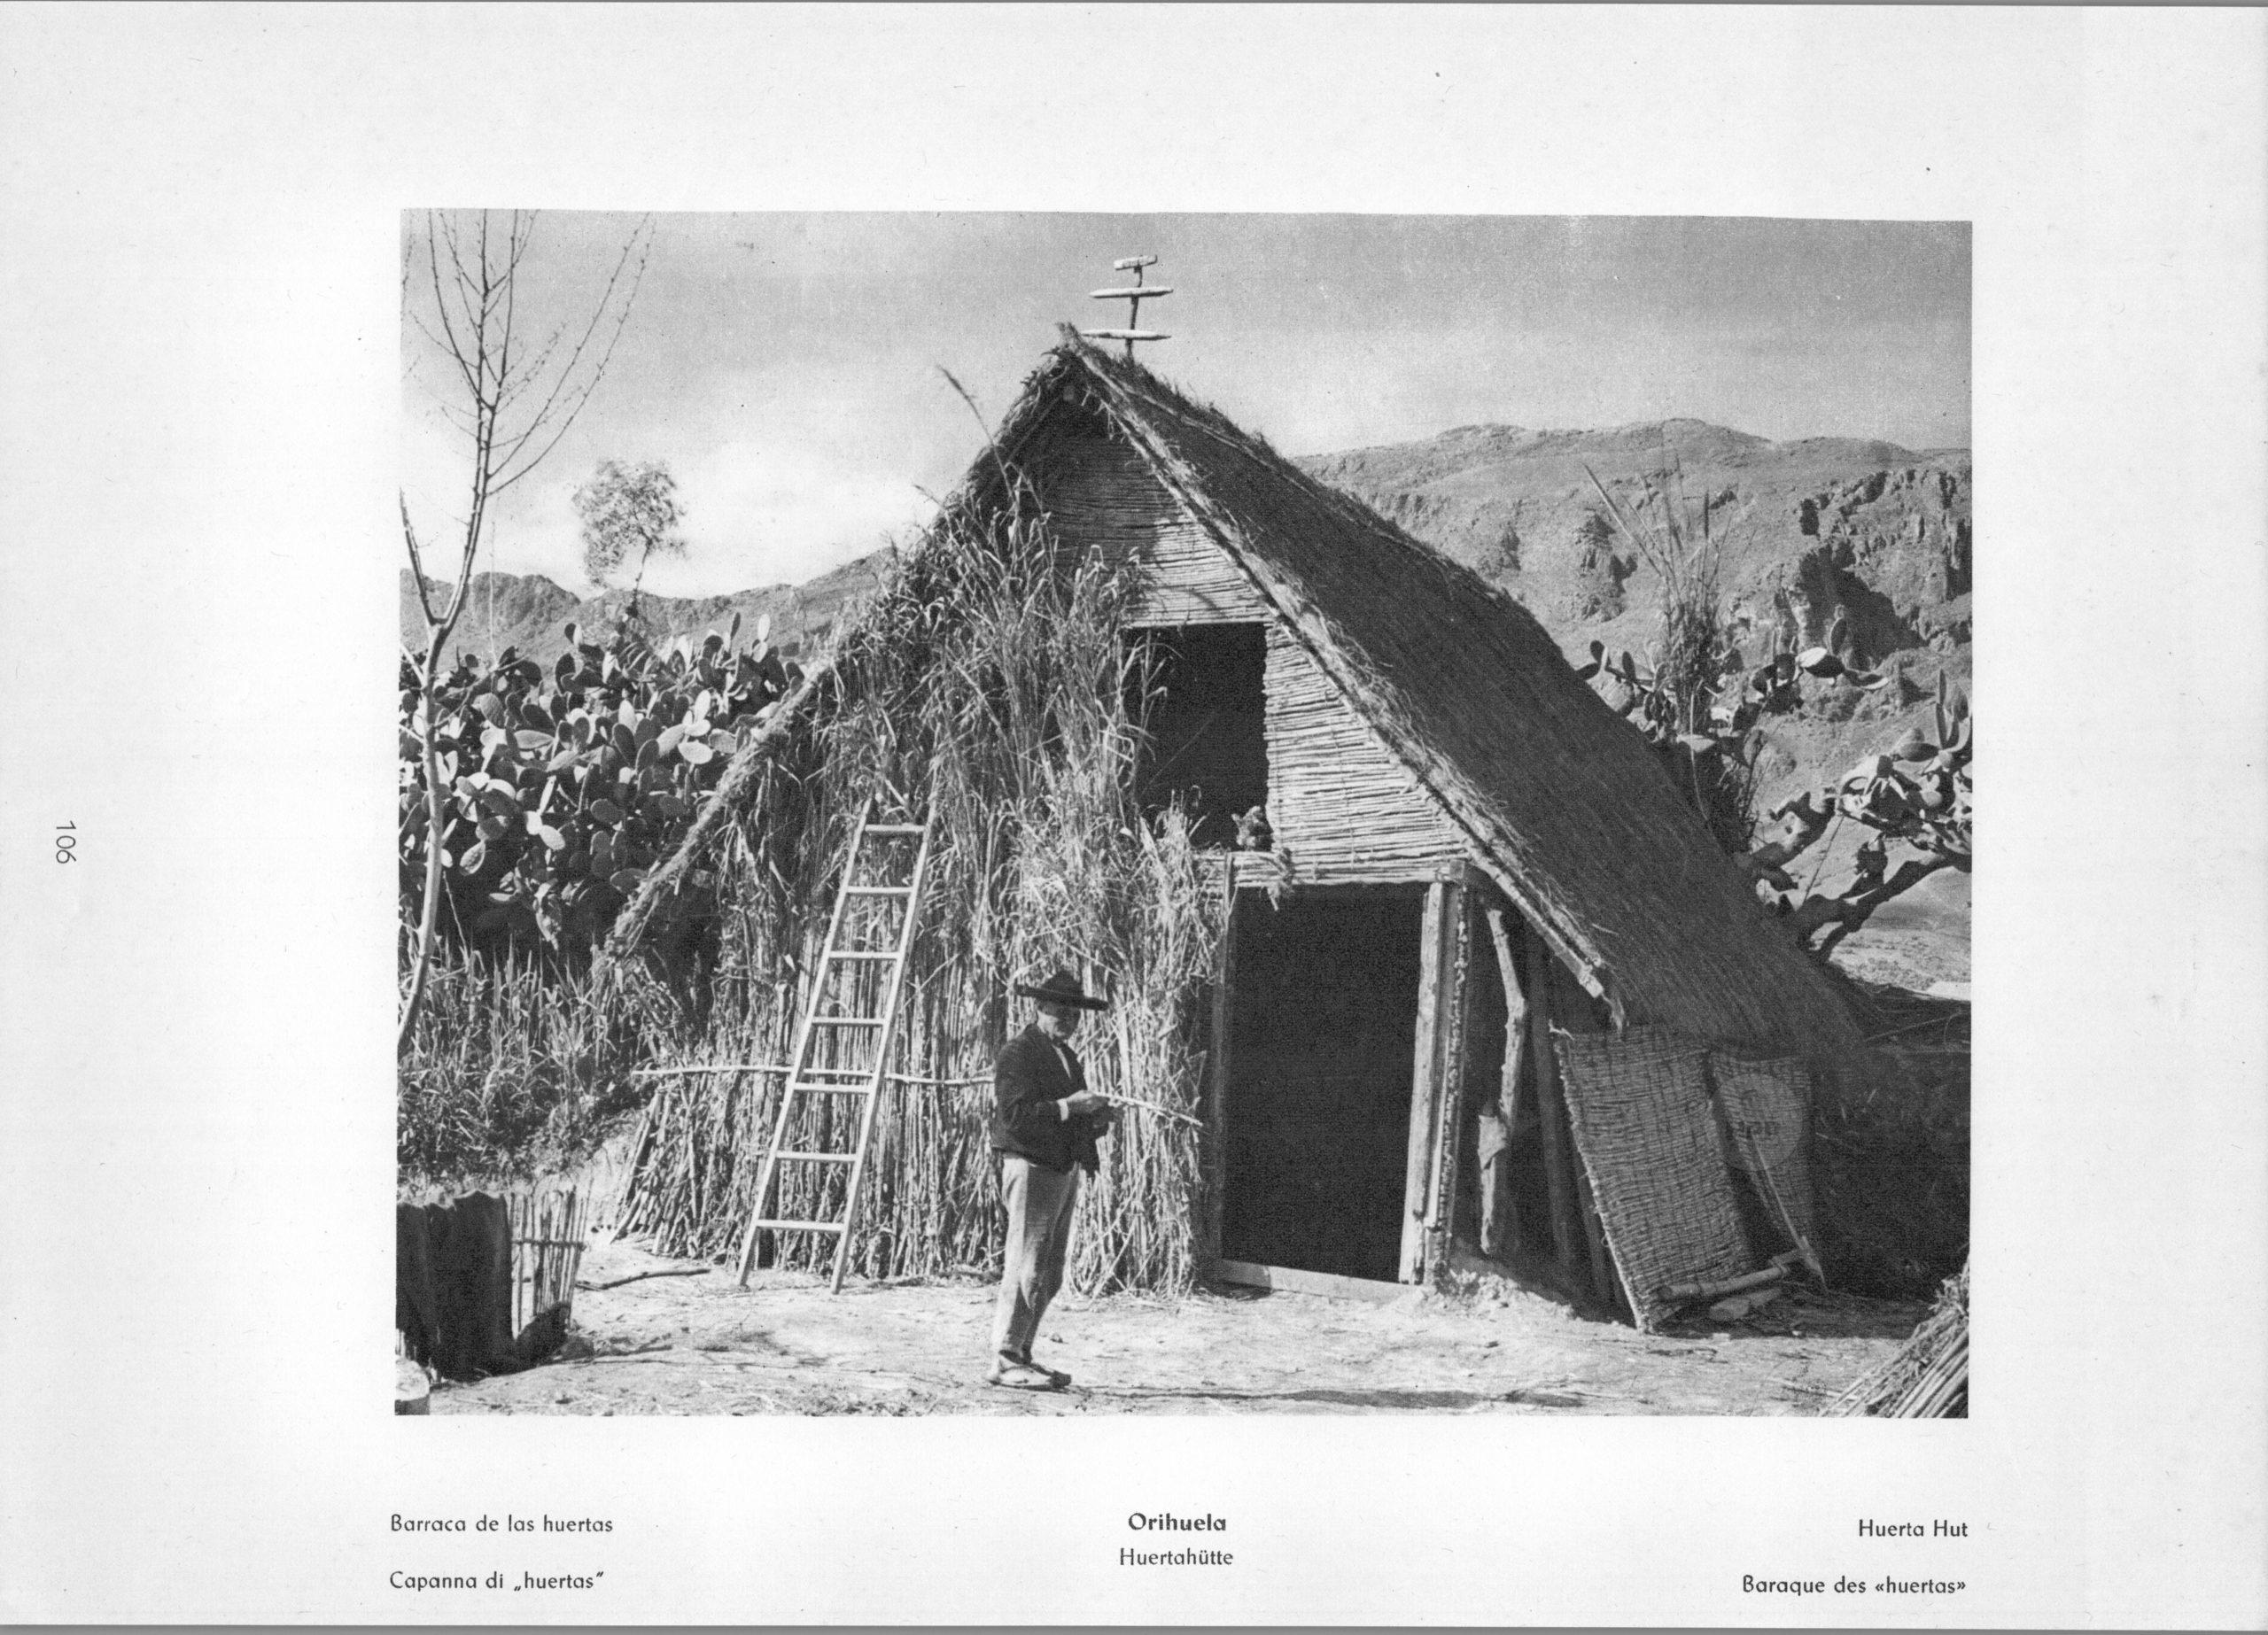 Orihuela - Huerta Hut